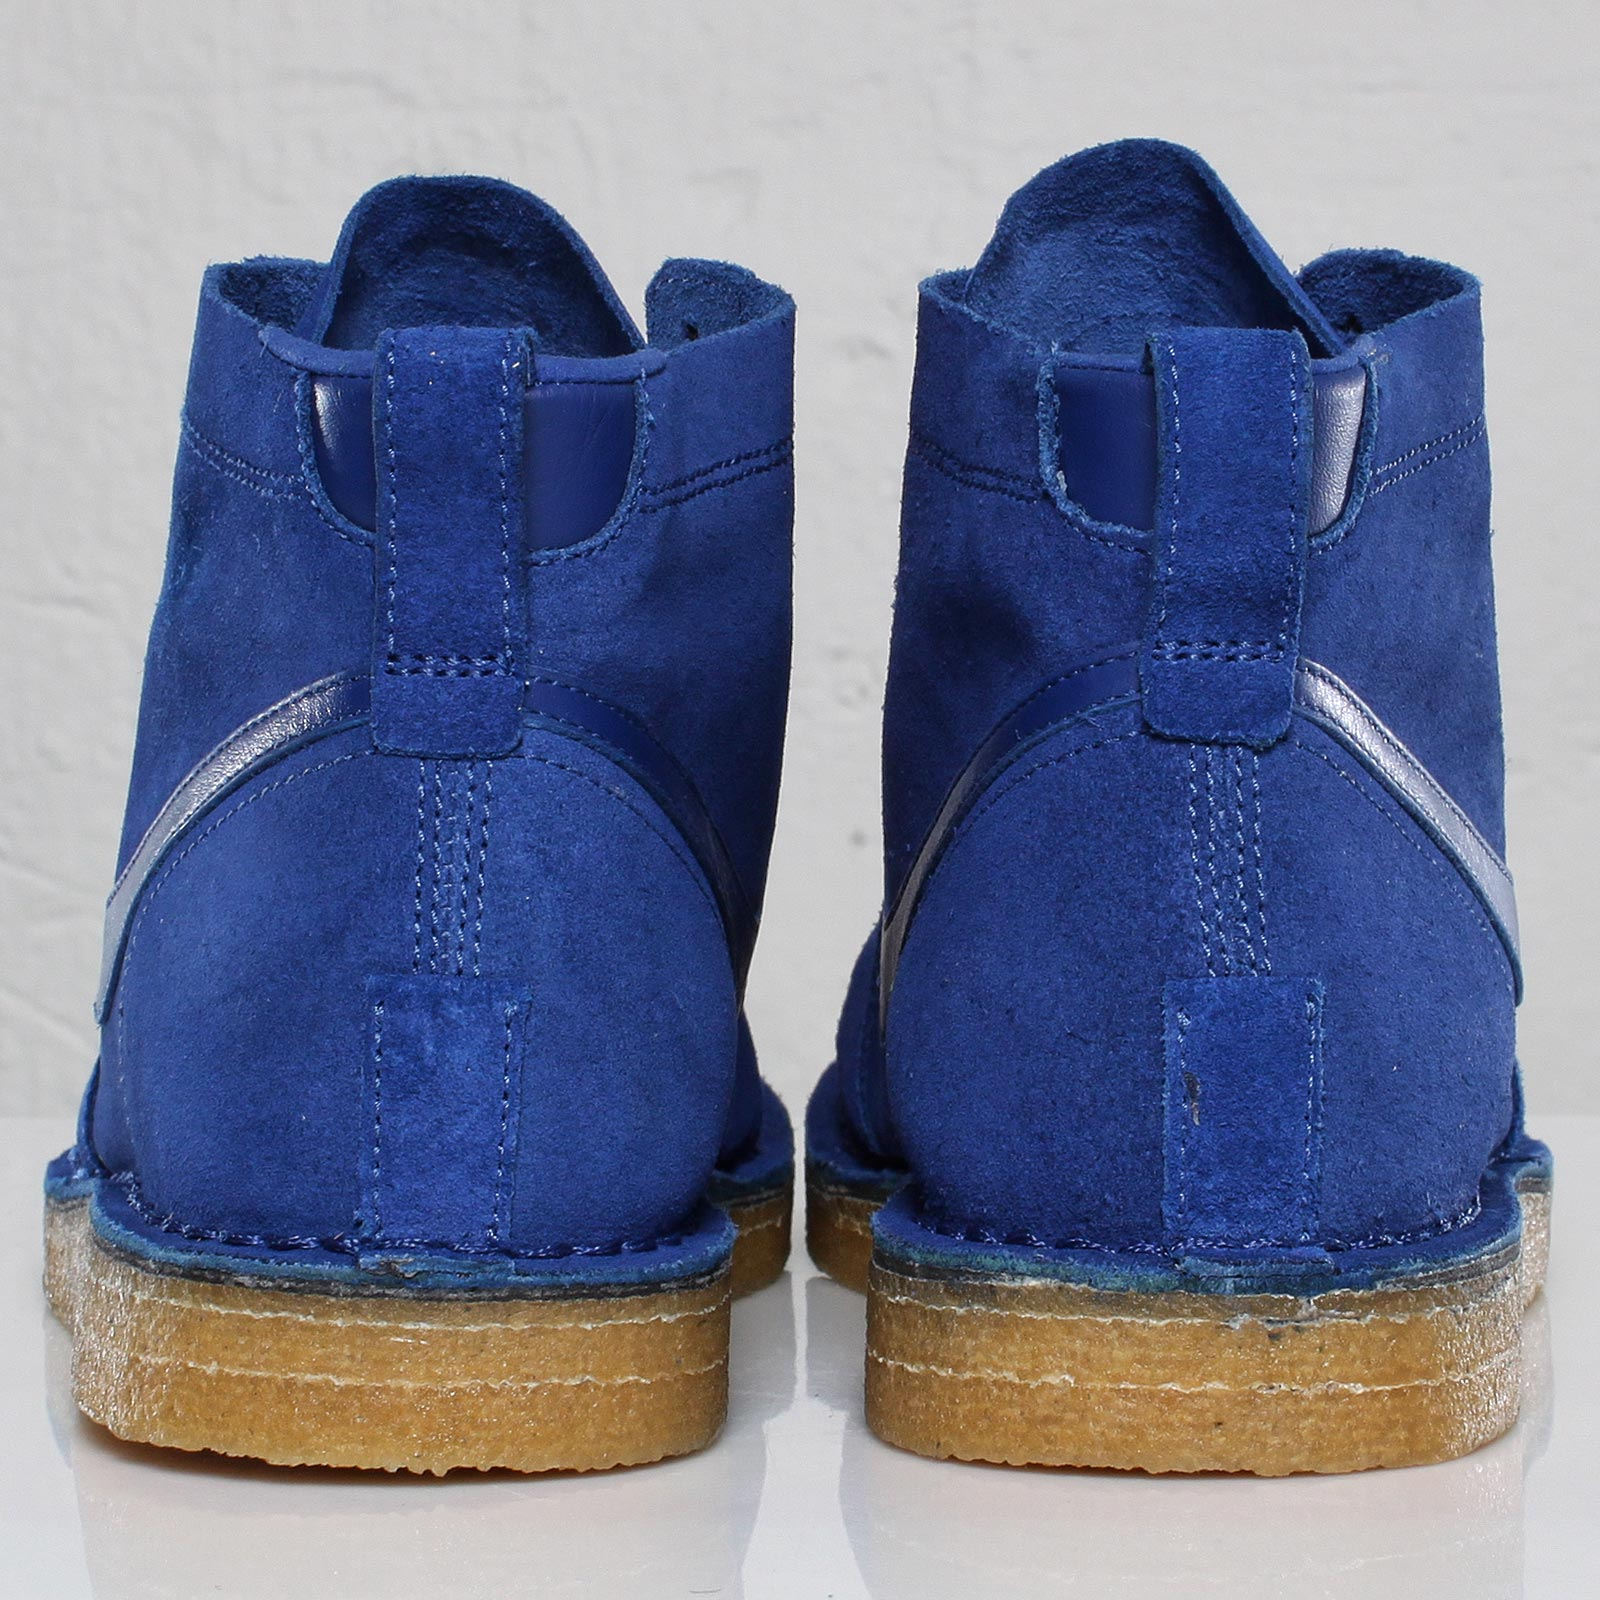 Nike Air Royal Mid SO TZ - 102423 - Sneakersnstuff  a8c72a533